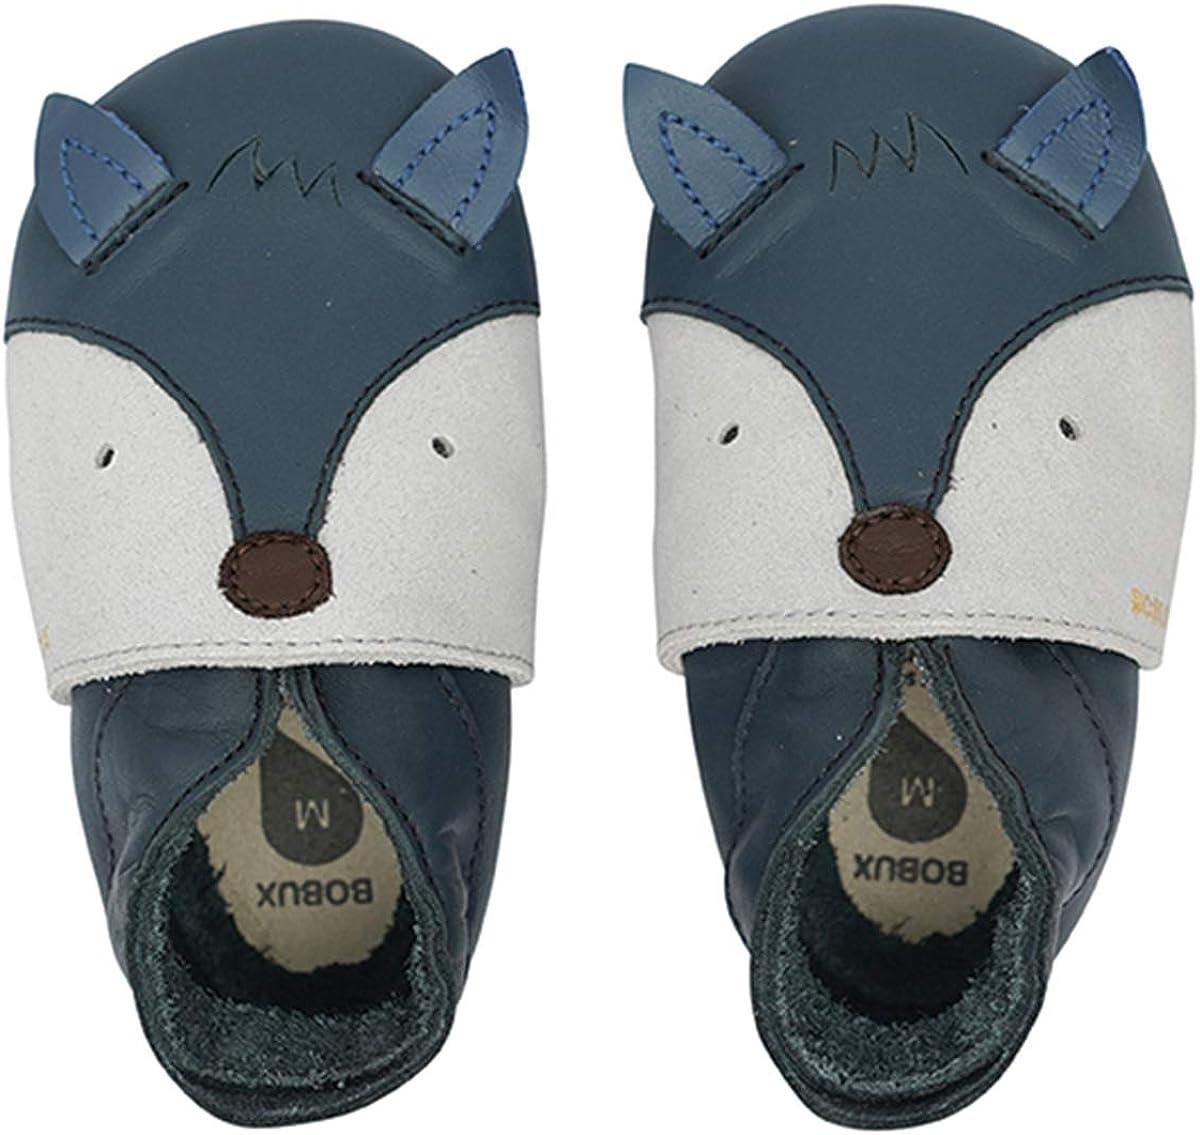 Chaussures Bebe Foxy Navy Pantoufle Bebe Bobux Chausson Cuir Souple B/éb/é